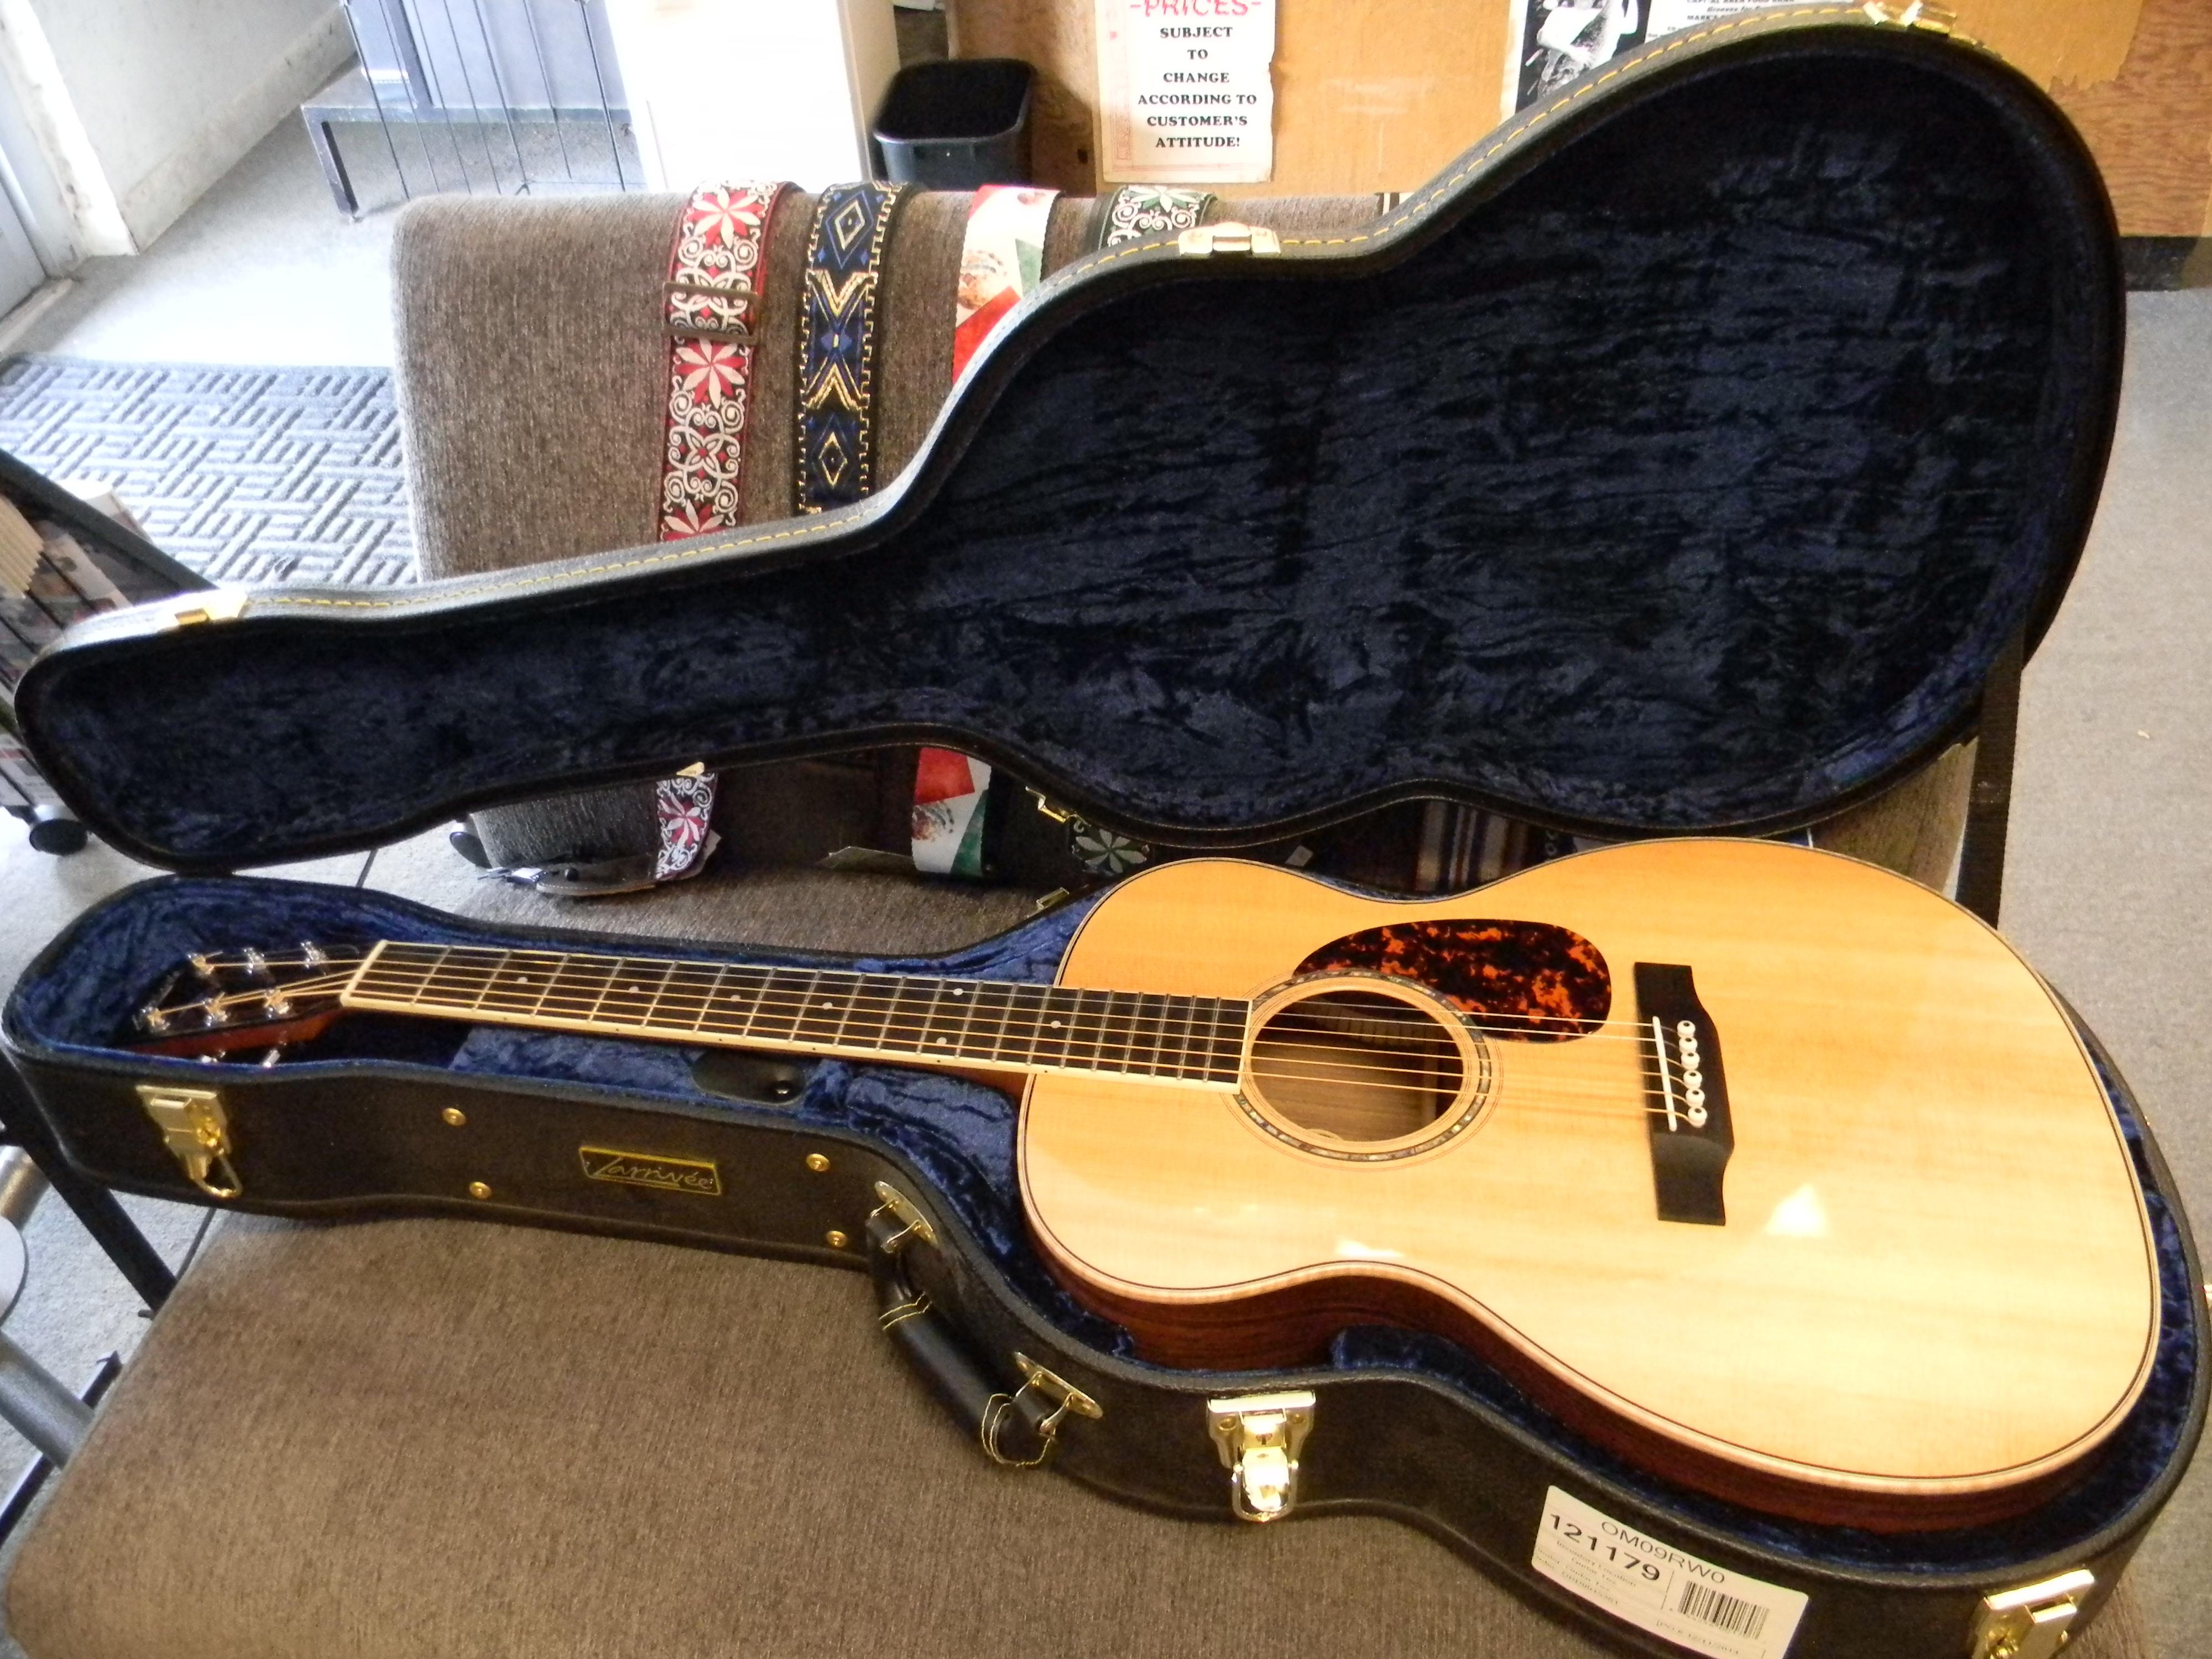 dscn9345 san antonio guitar store guitar tex. Black Bedroom Furniture Sets. Home Design Ideas